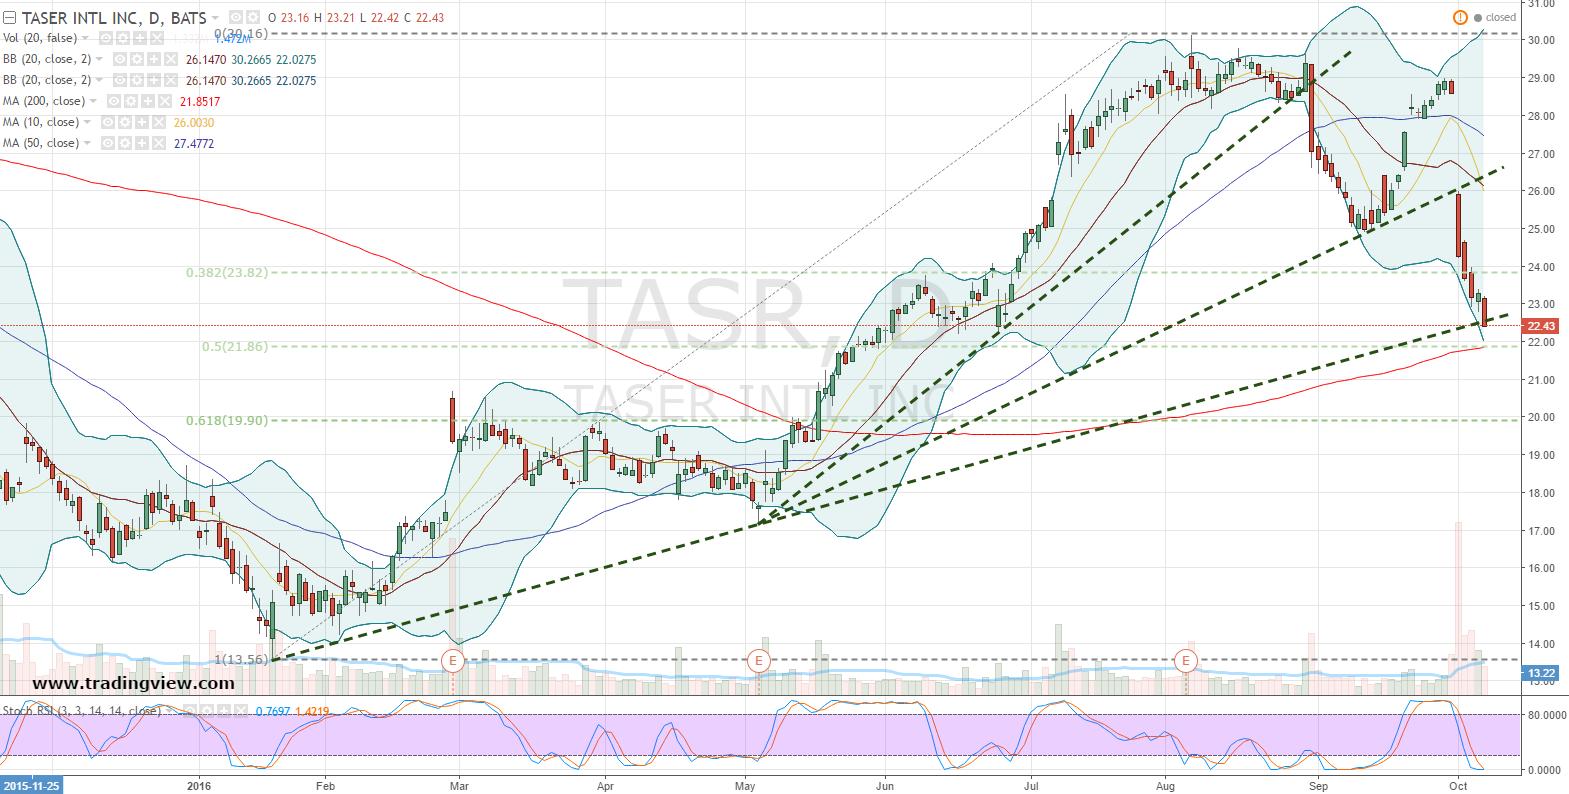 Taser Stock: Set Your Buy Order to